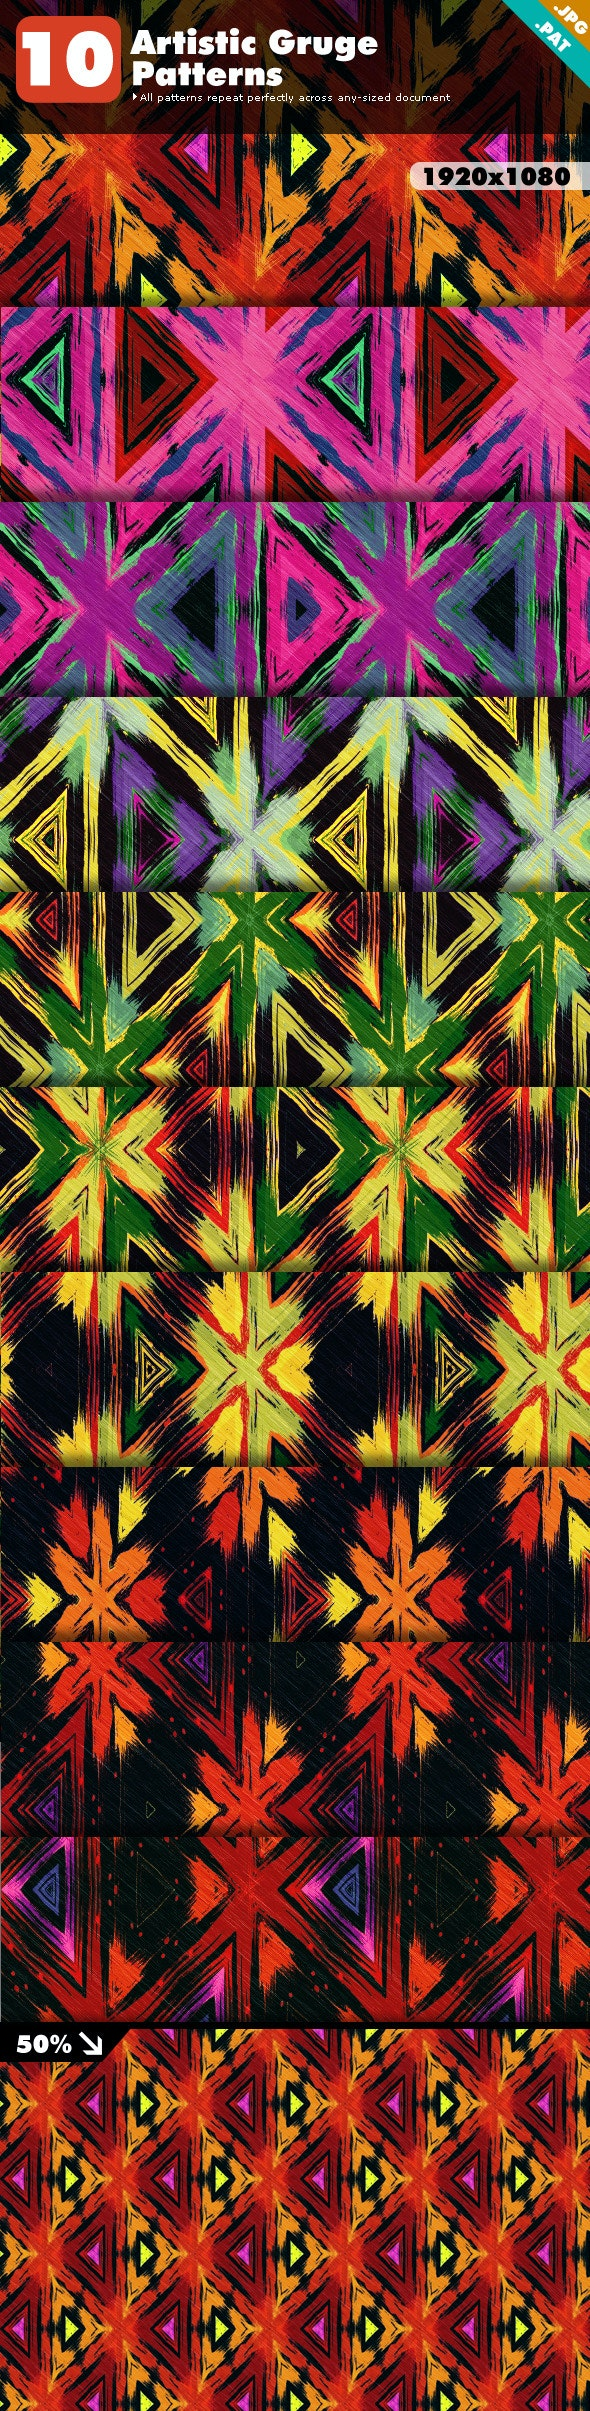 Artistic Grunge Patterns - Artistic Textures / Fills / Patterns